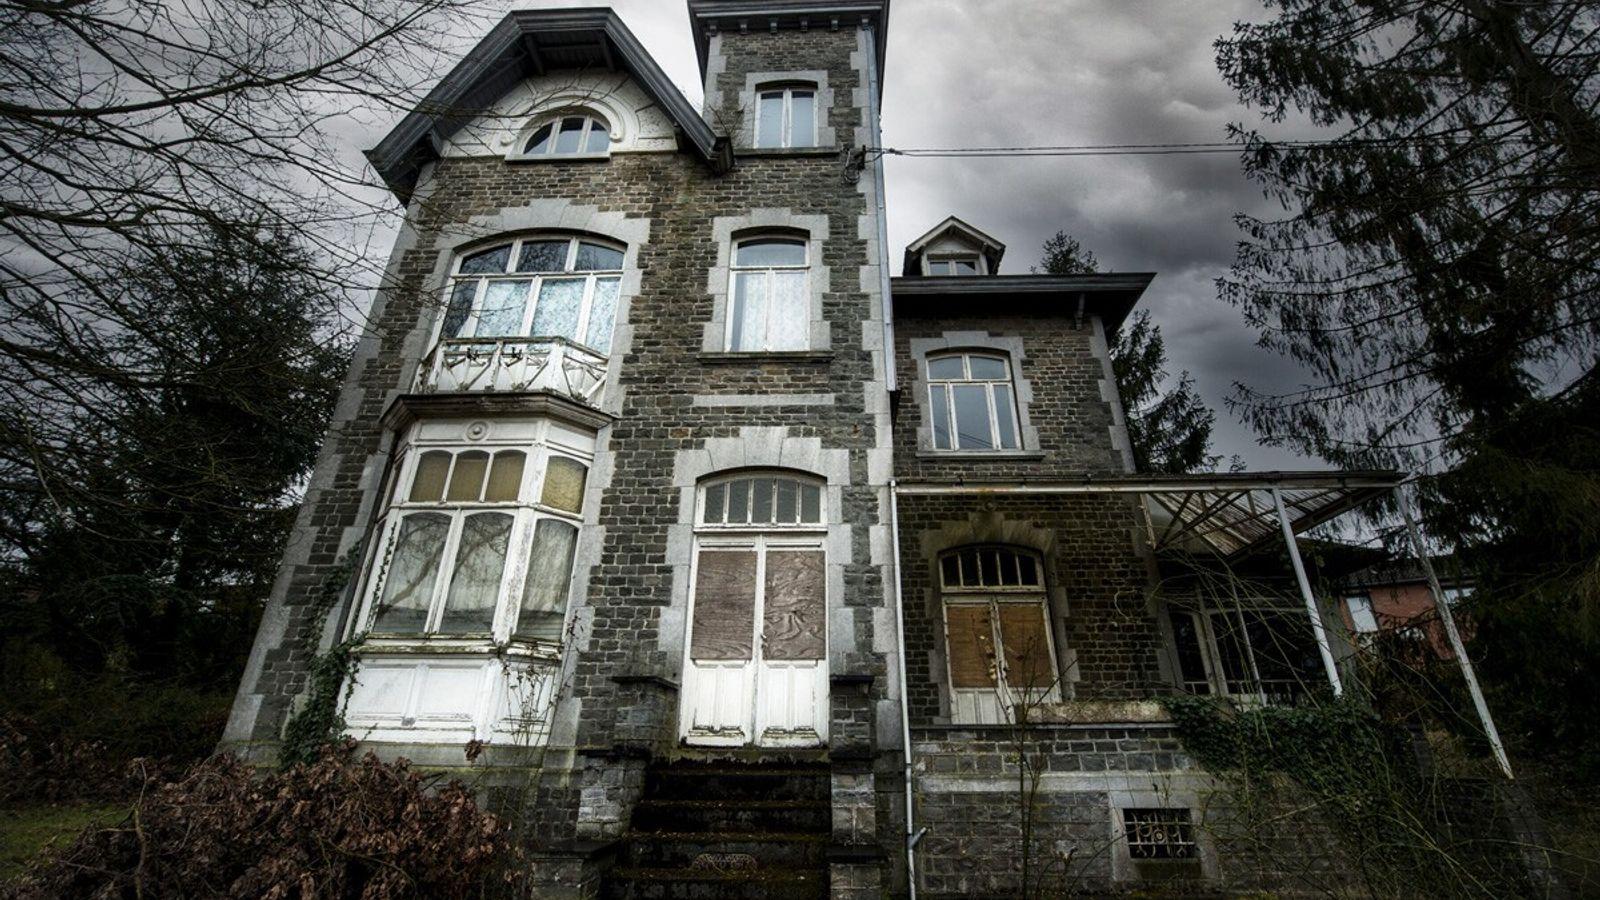 gruseliges Spukhaus